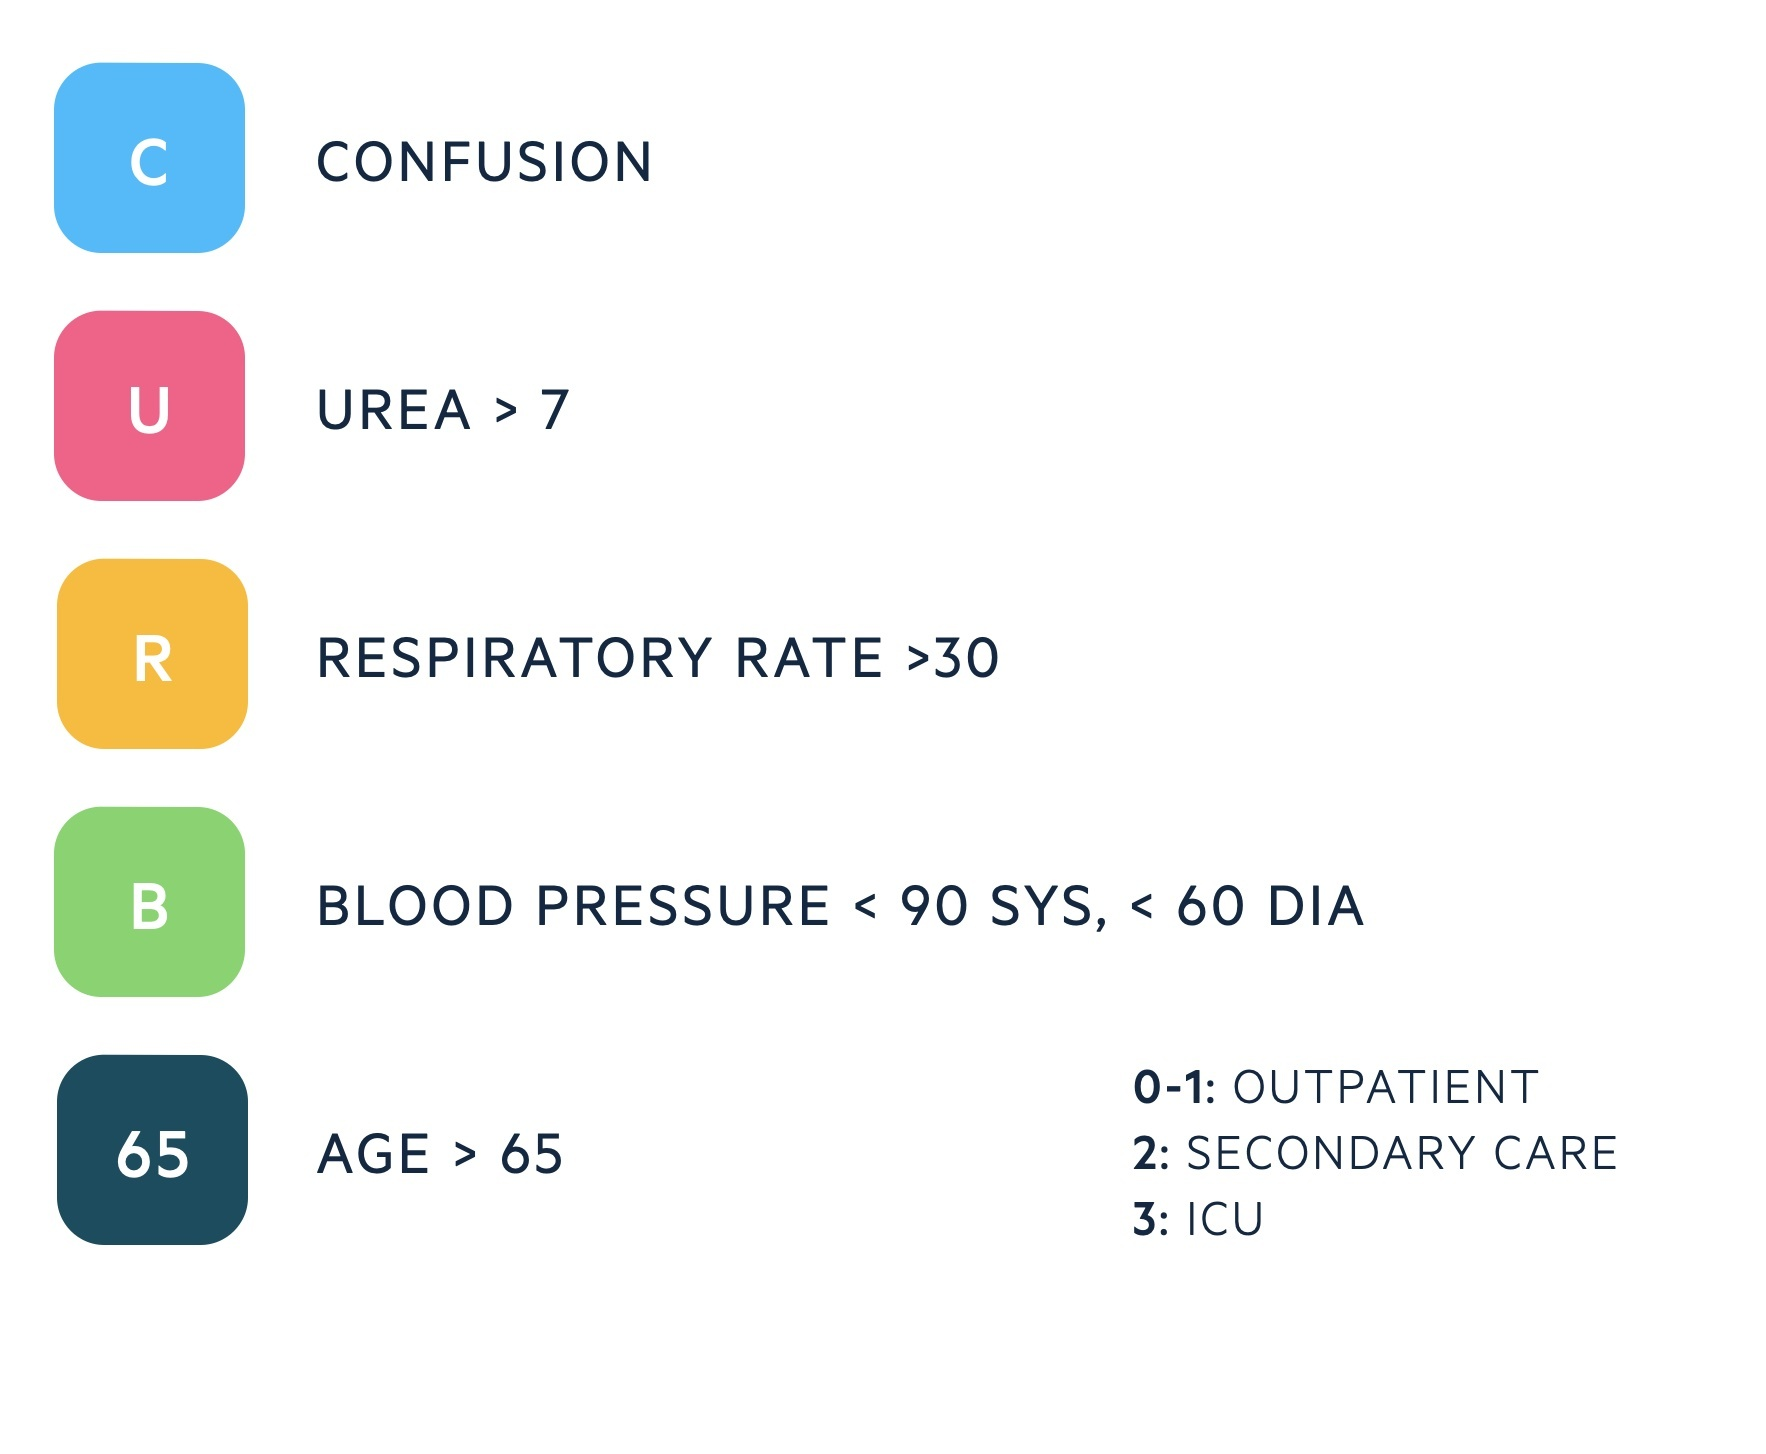 CURB-65 for pneumonia